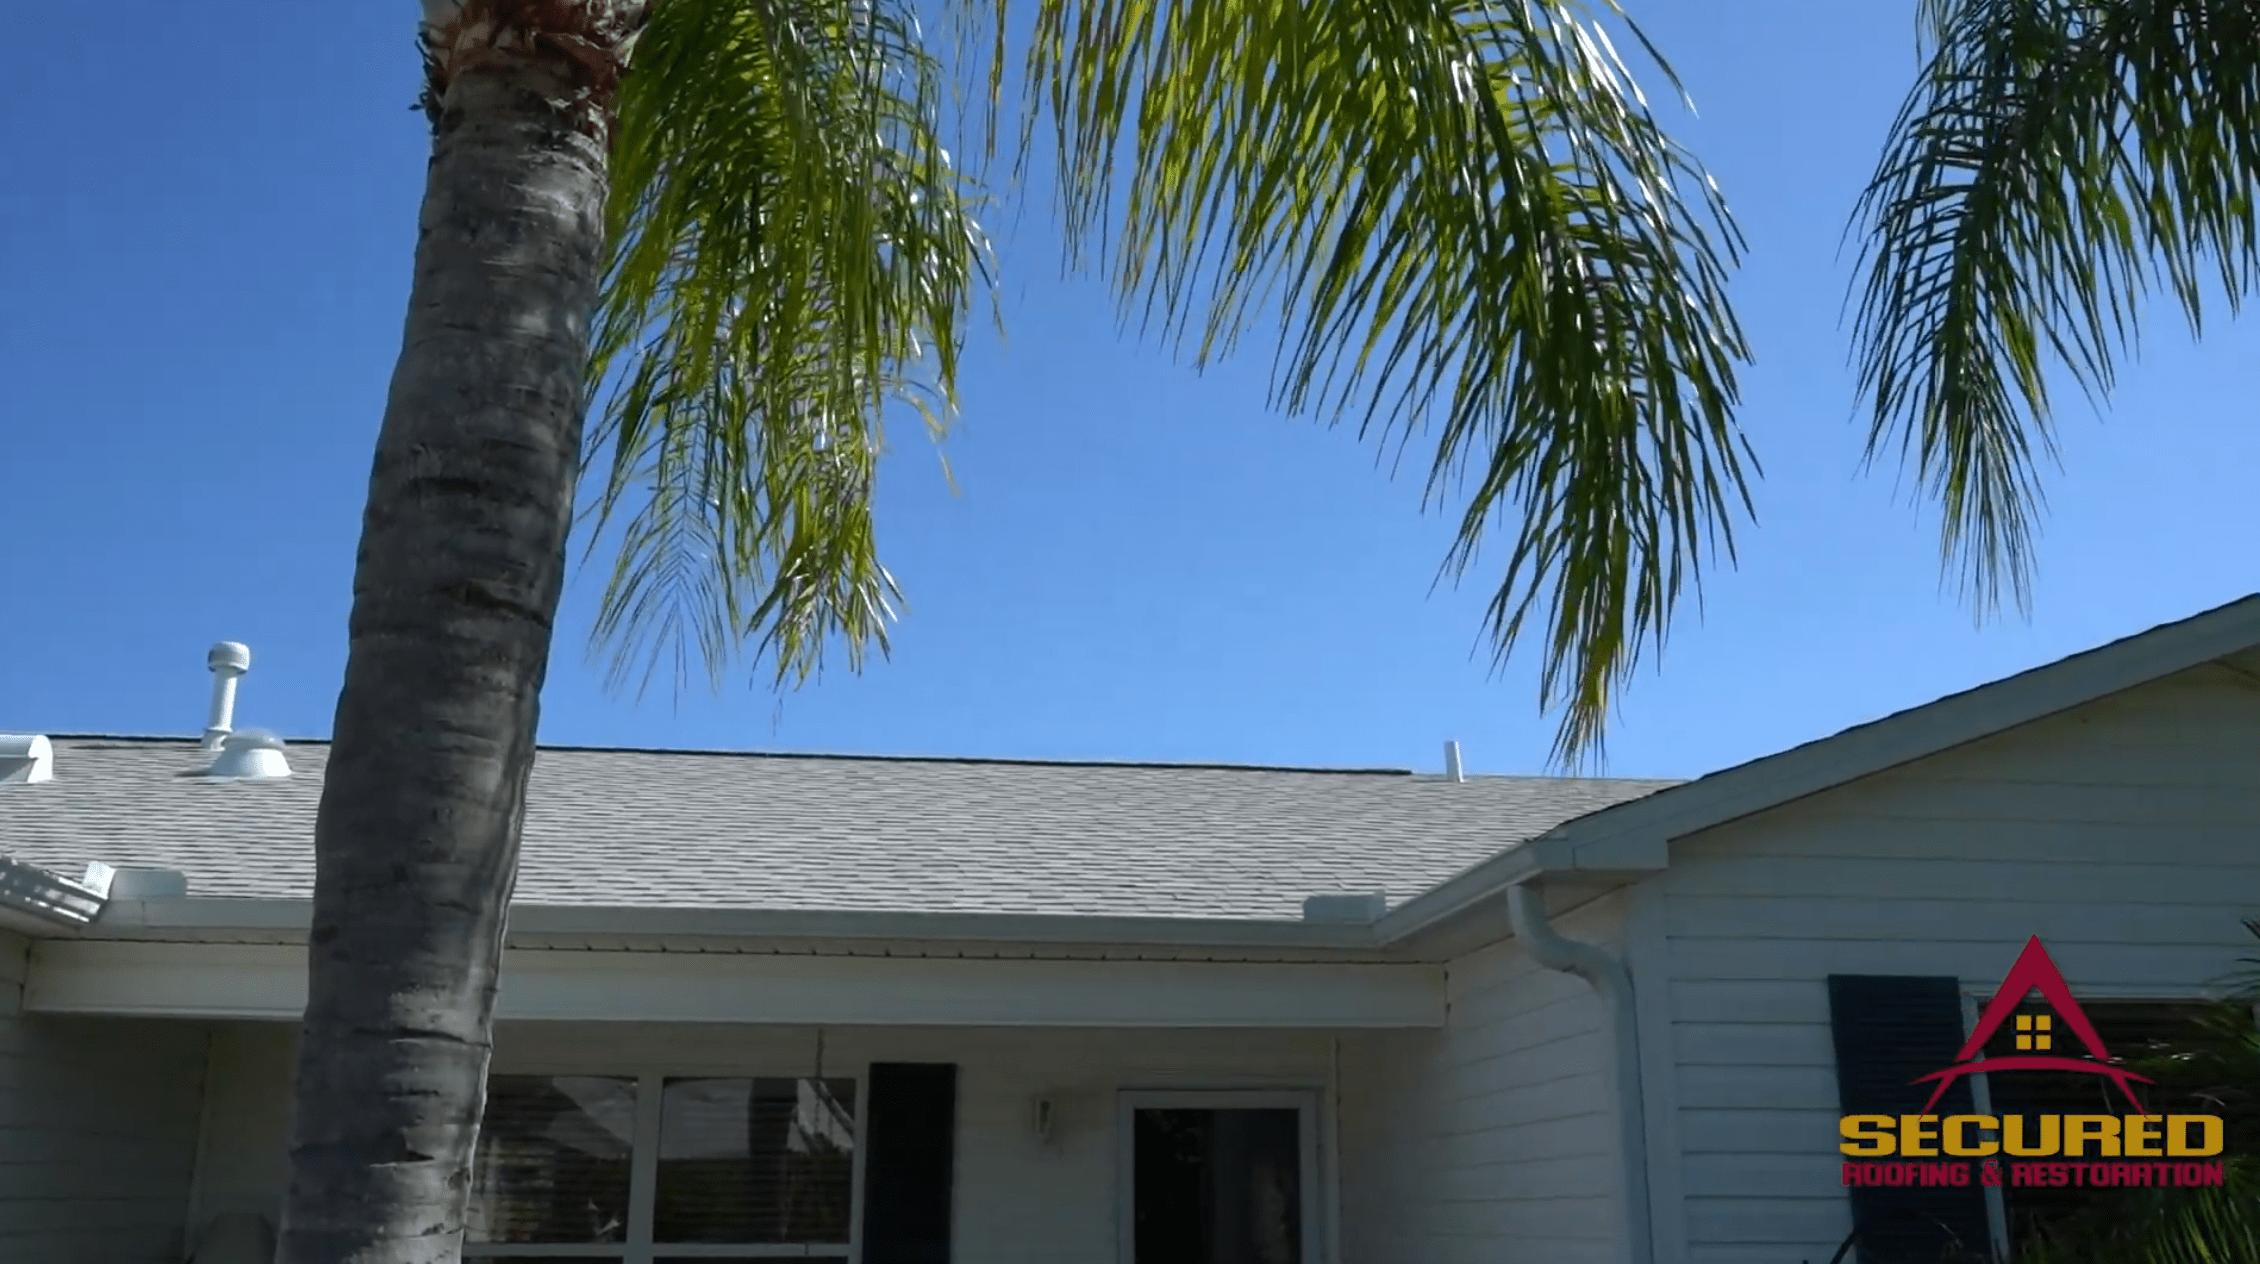 palm tree and house